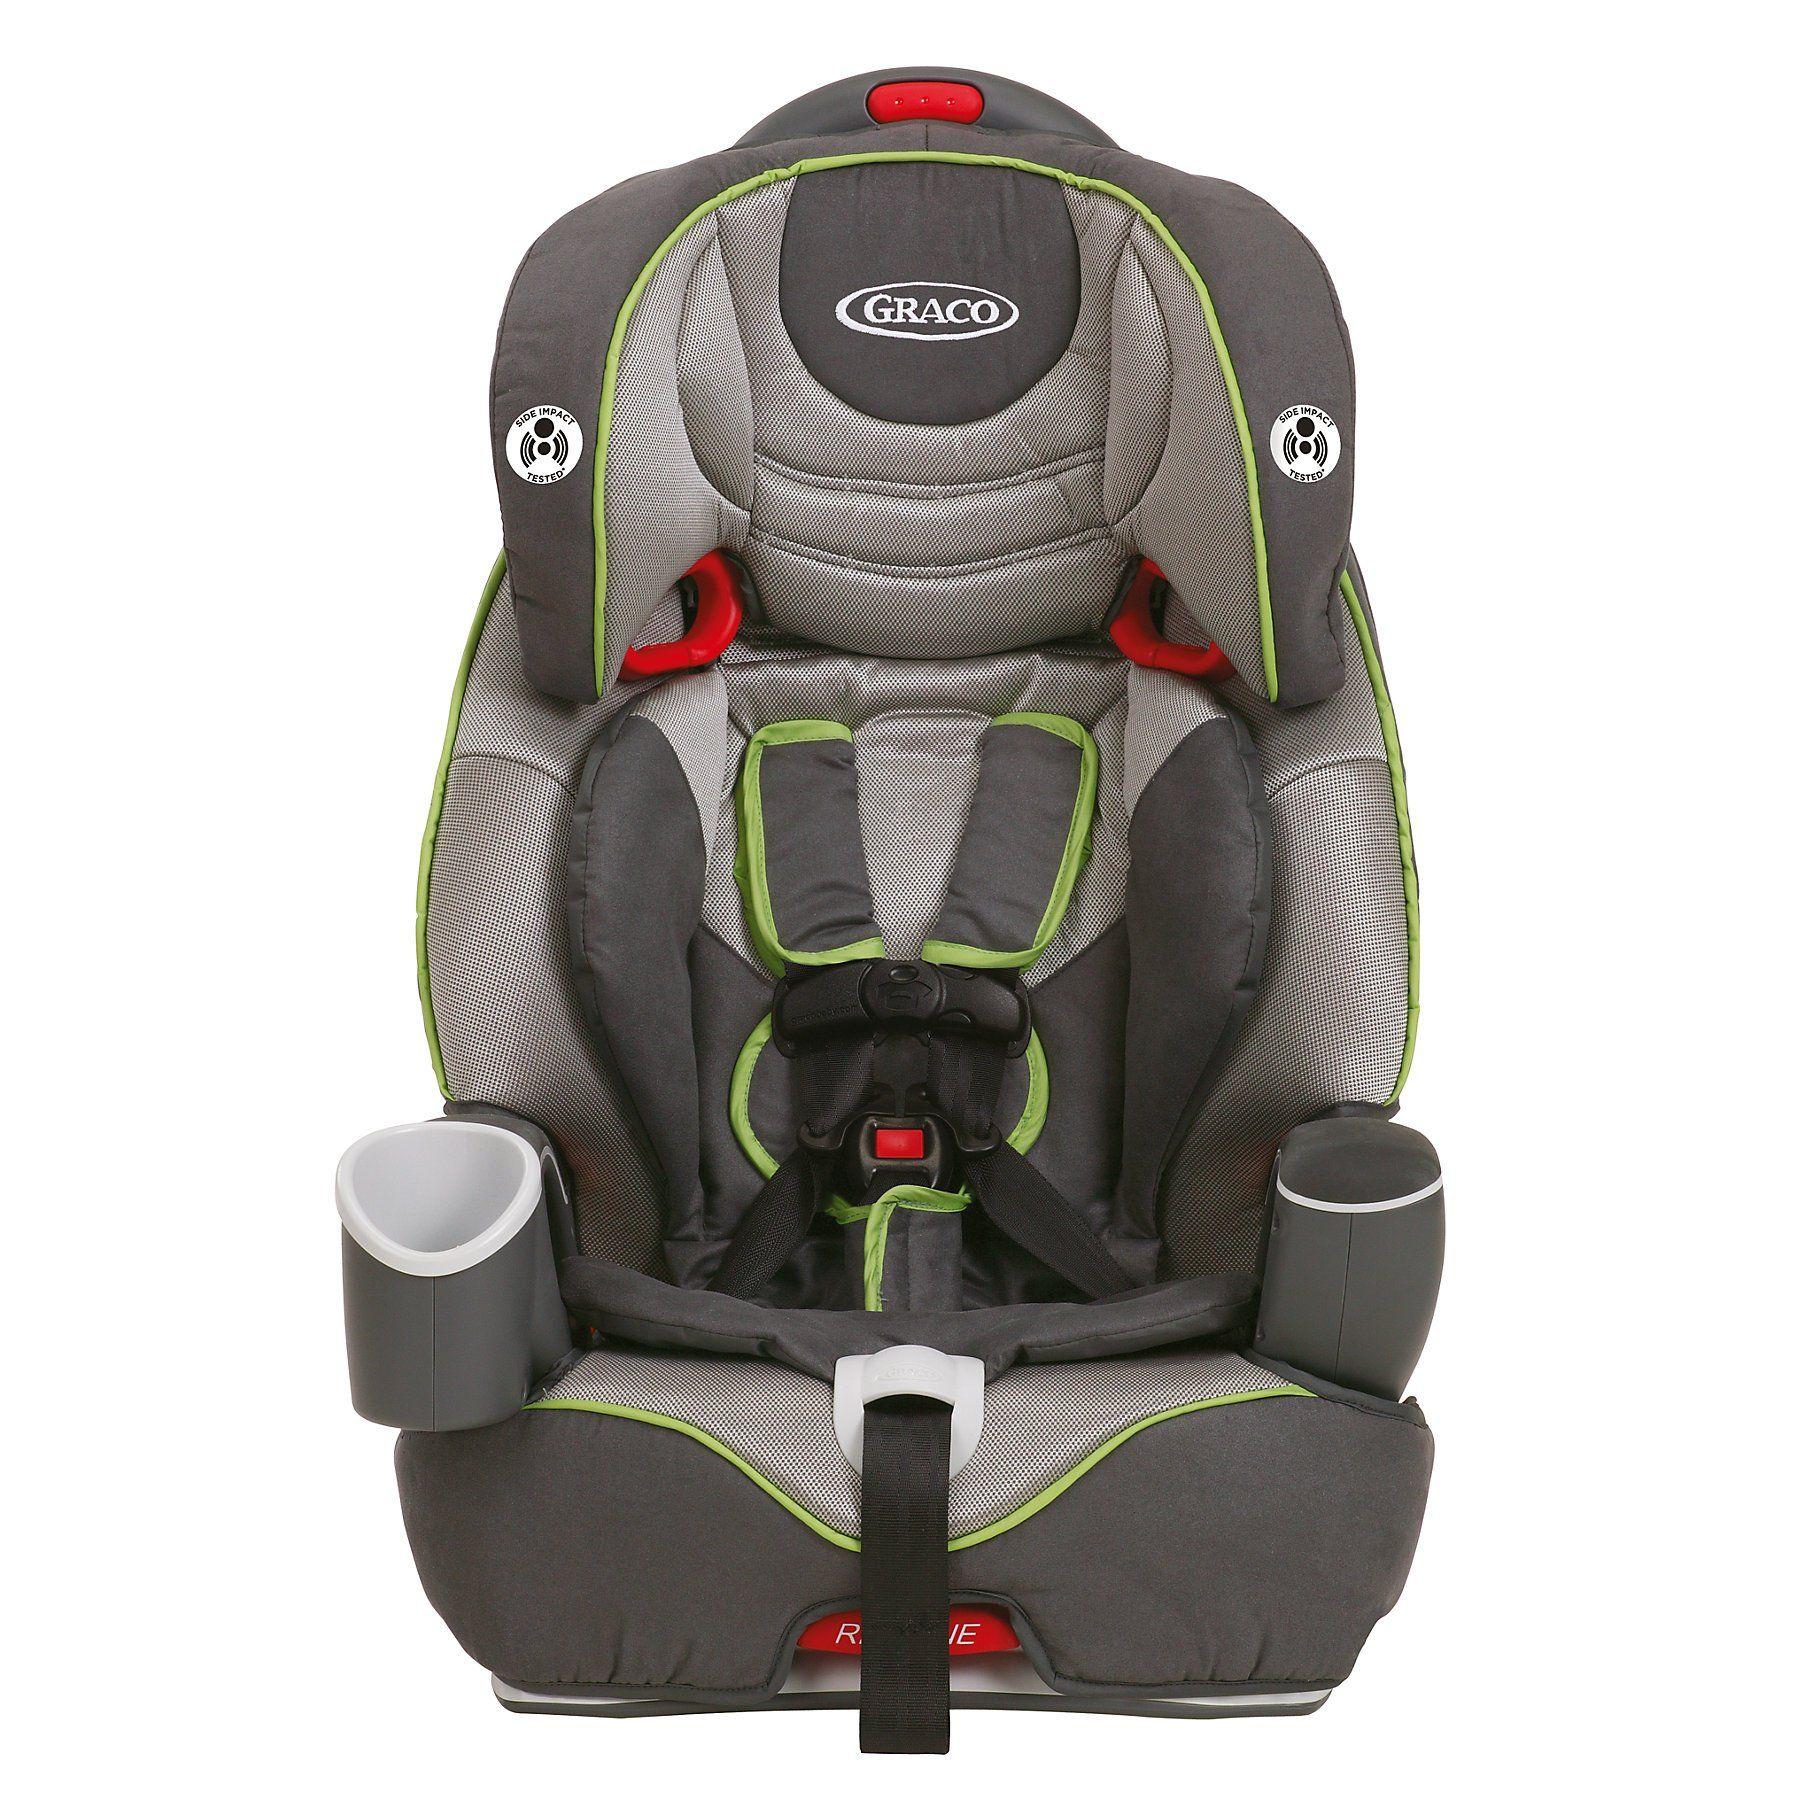 Graco Nautilus MultiStage Car Seat, Gavit, Grey/Green